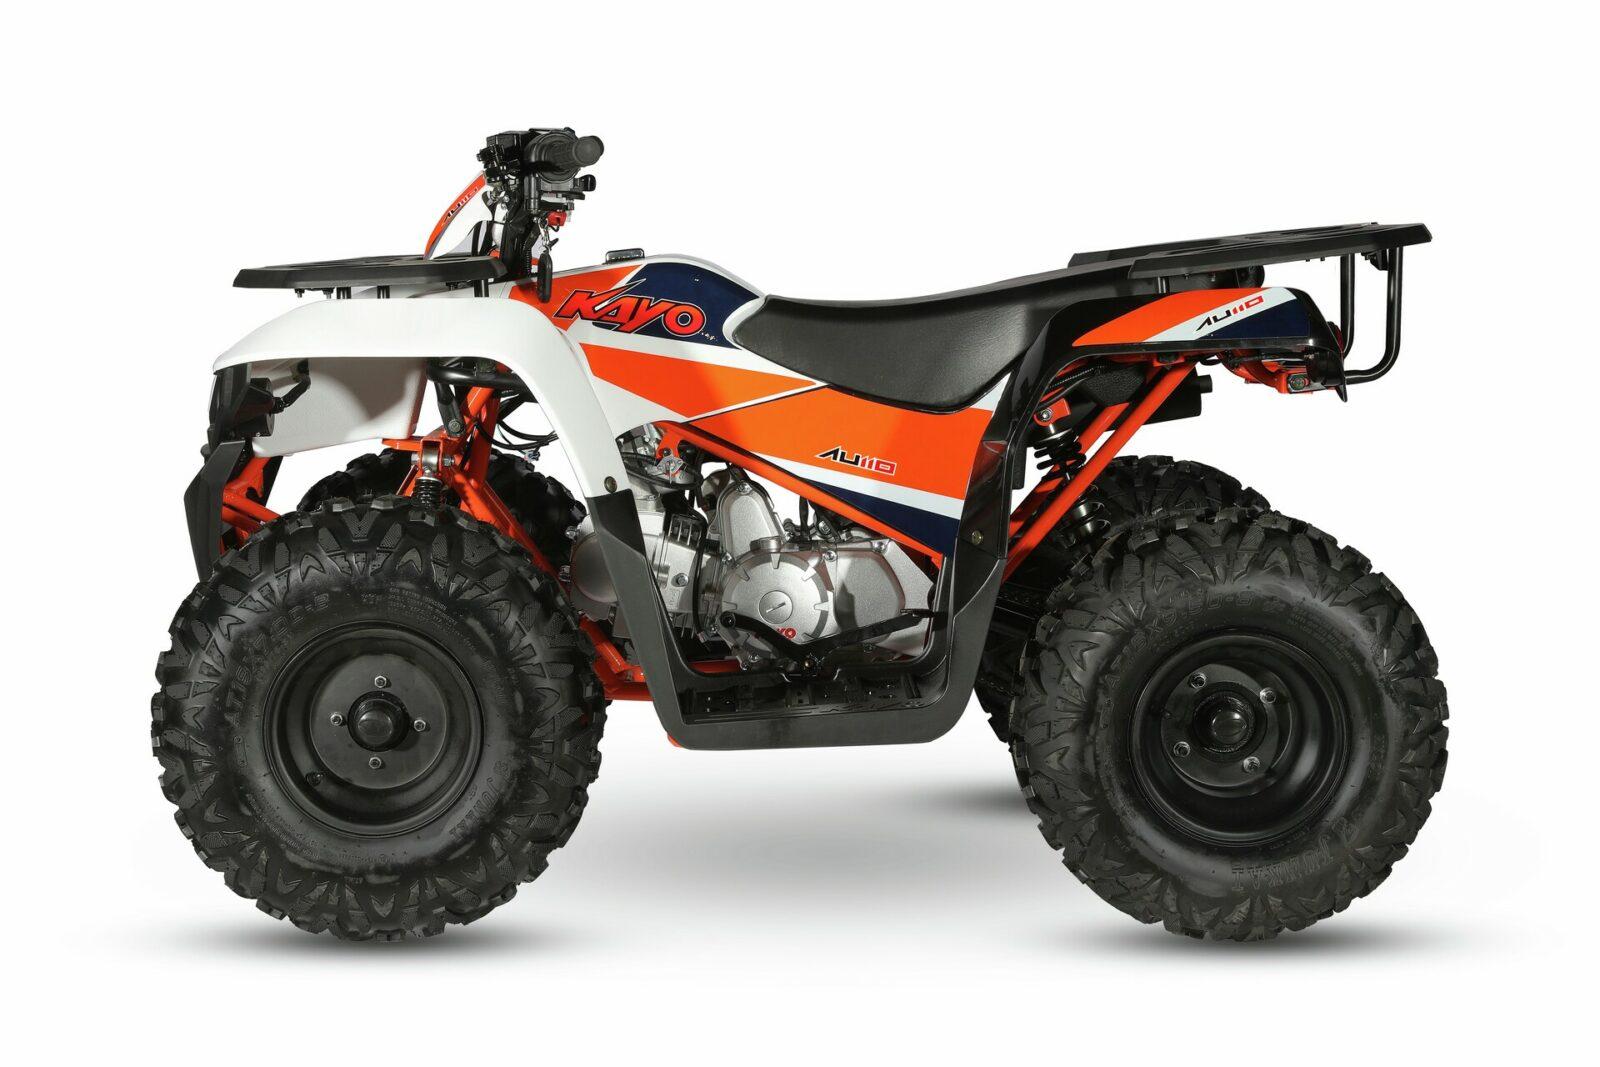 KAYO AU110 ATV 01933 1920